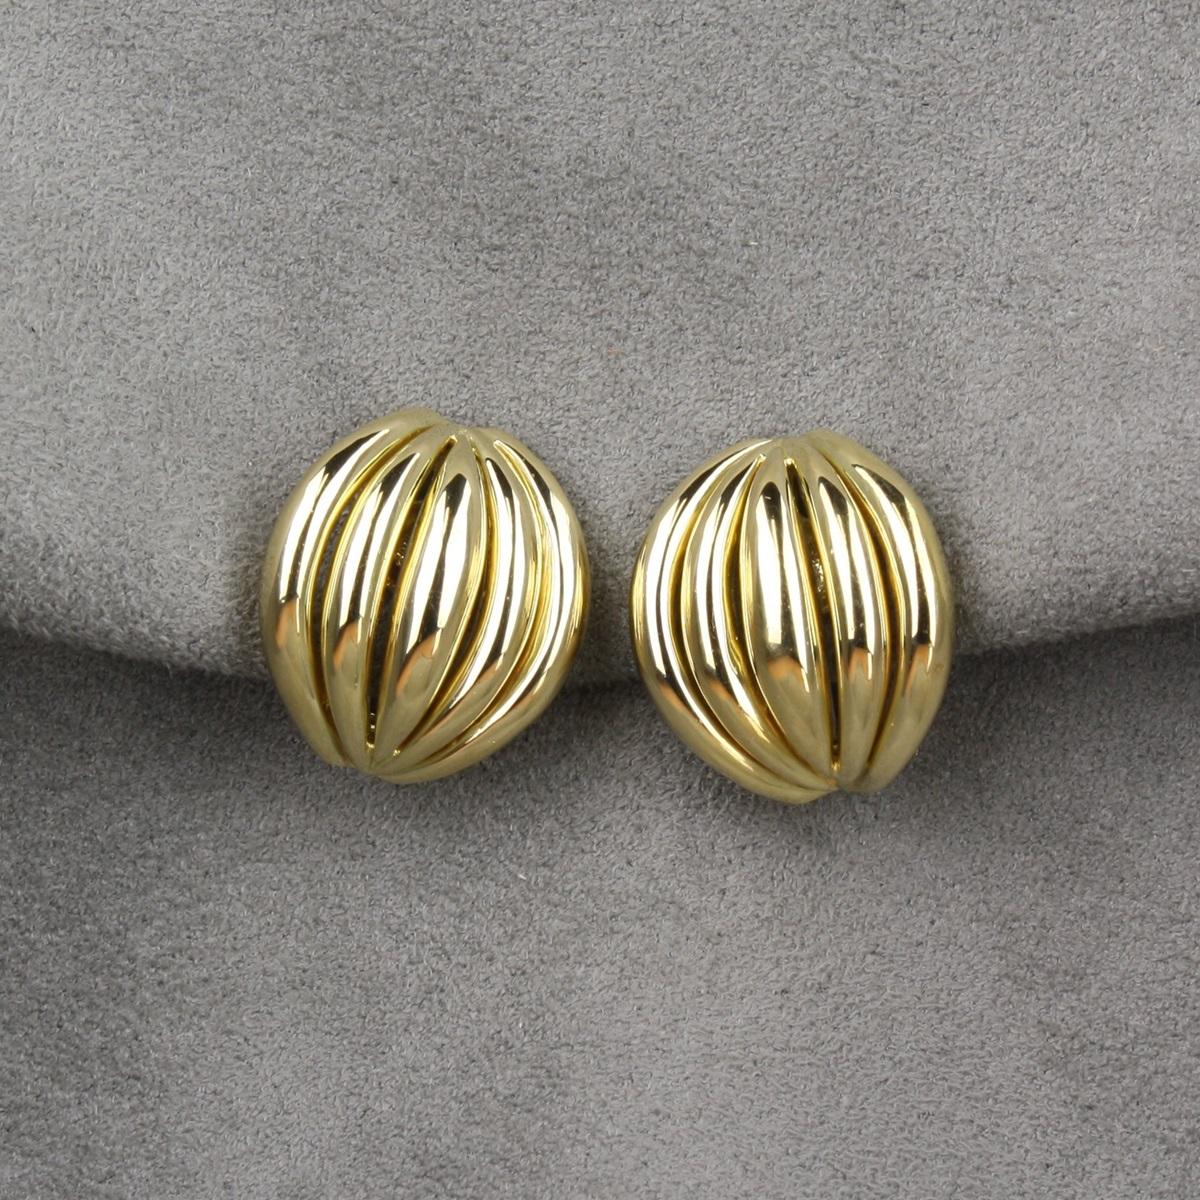 PreOwned Italian 18 Karat Yellow Gold Clip On Earrings